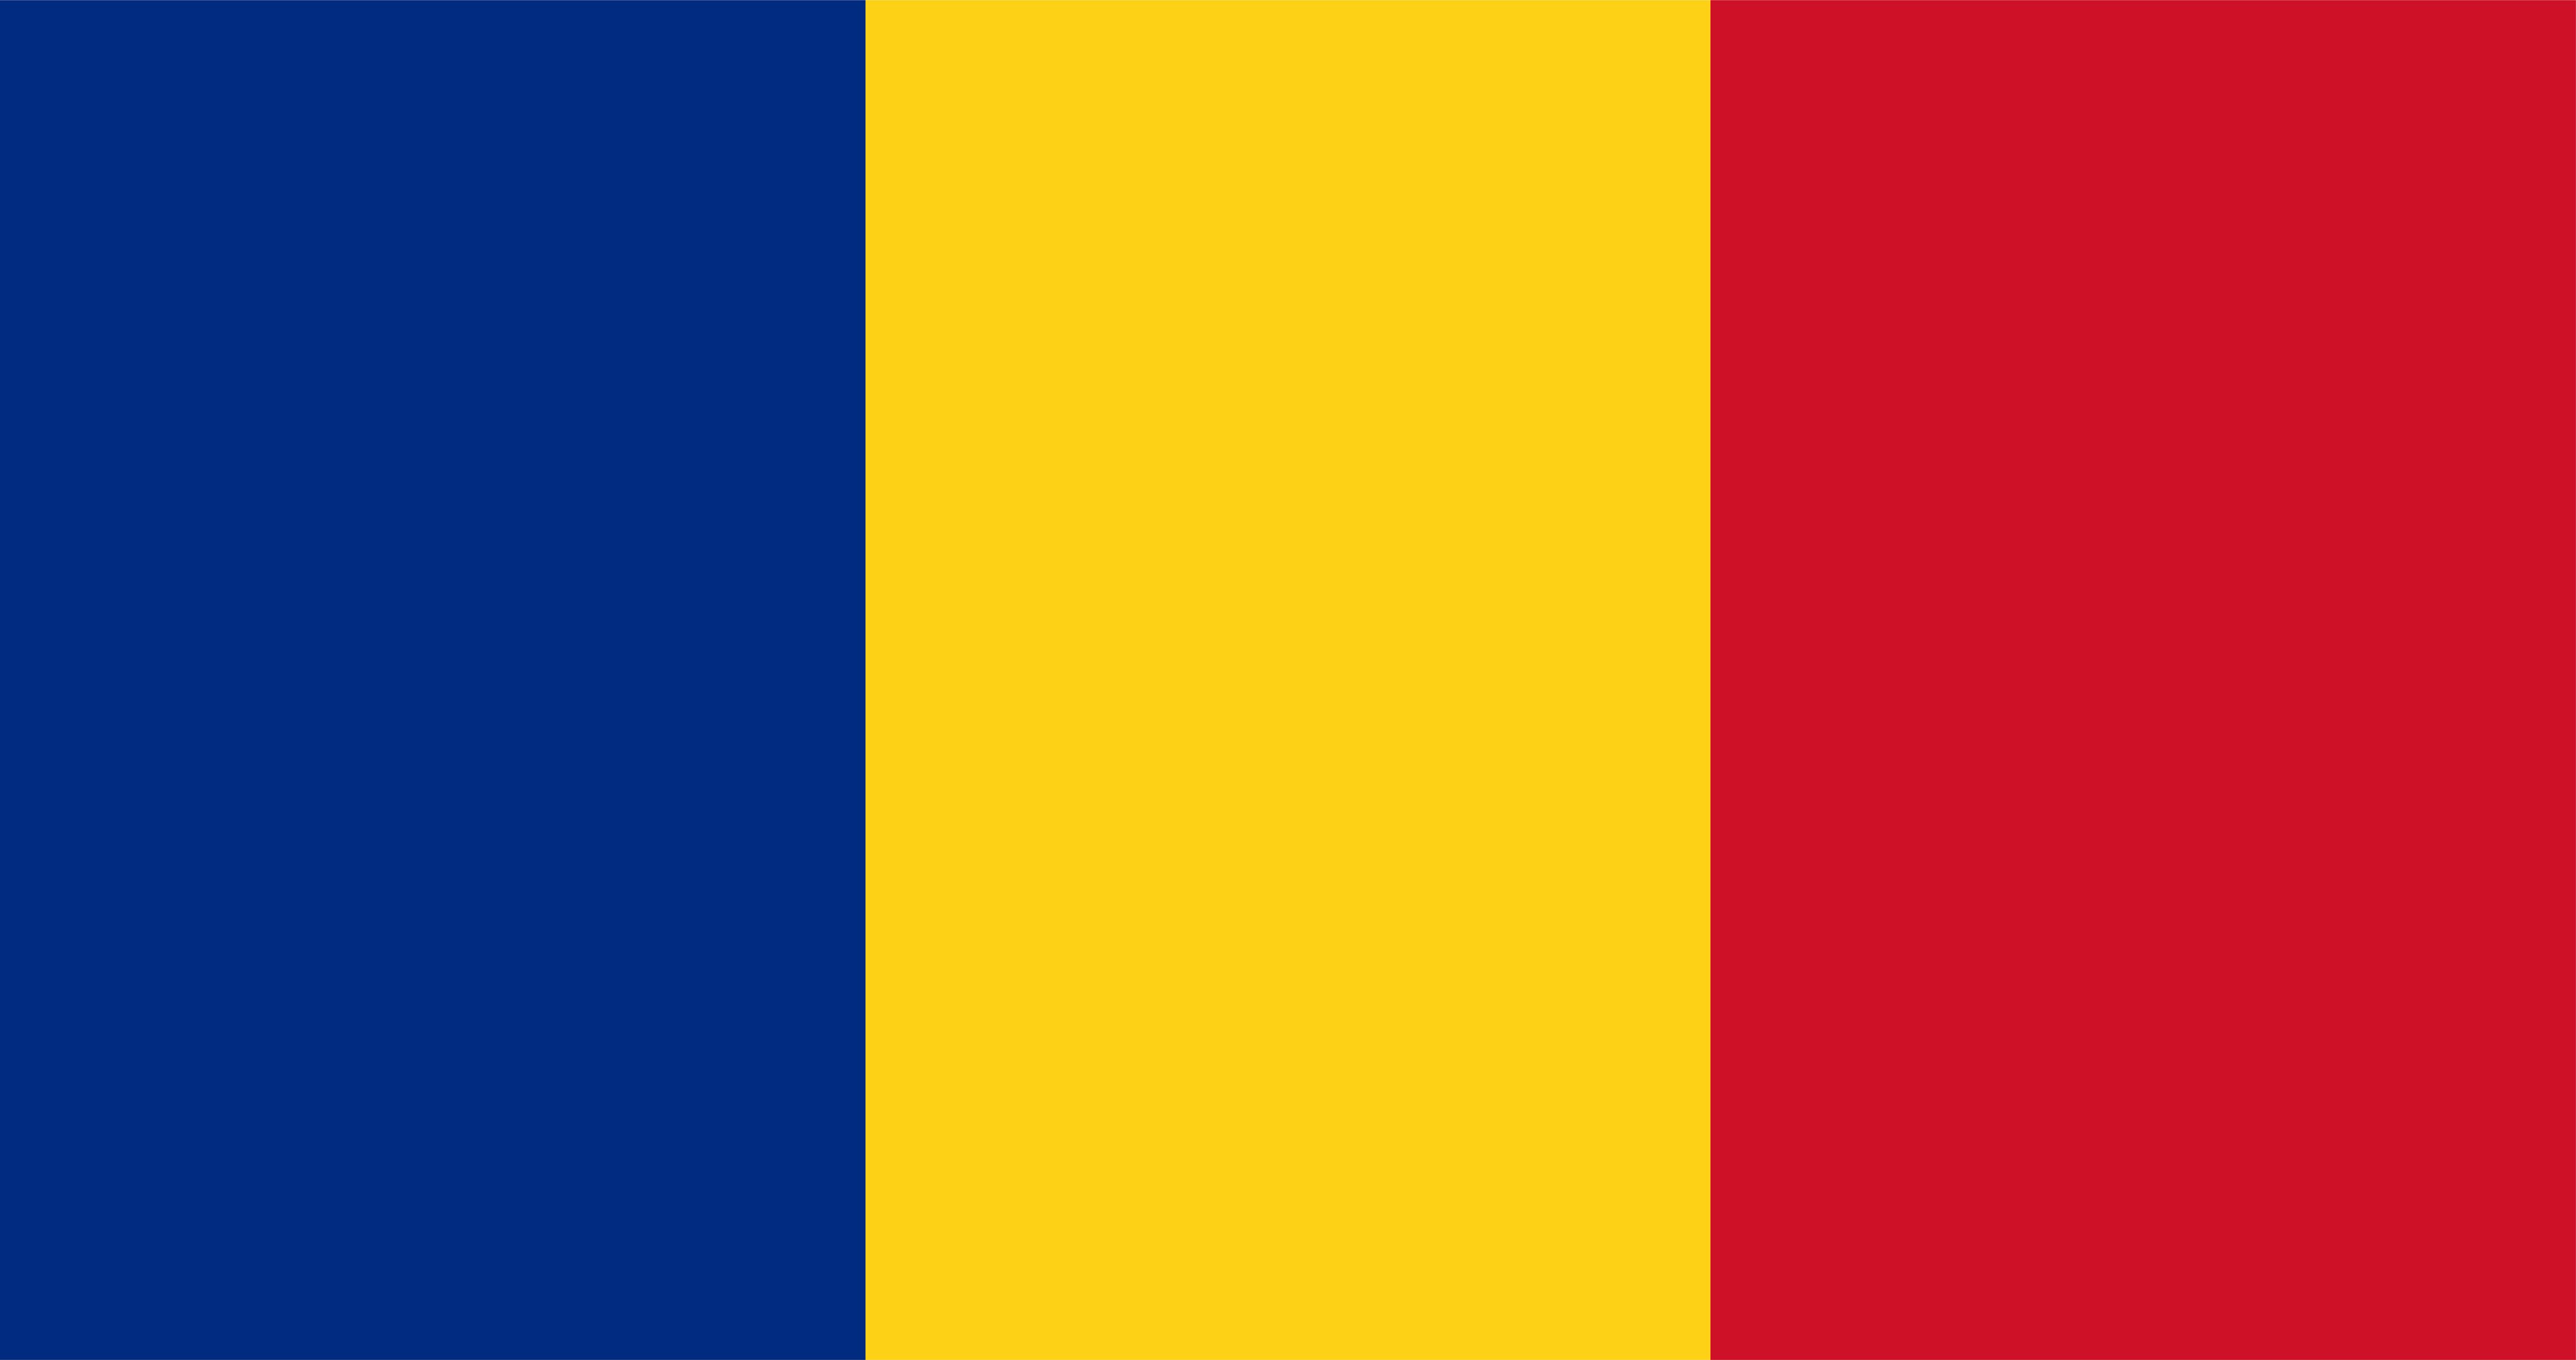 kuchnia rumunska